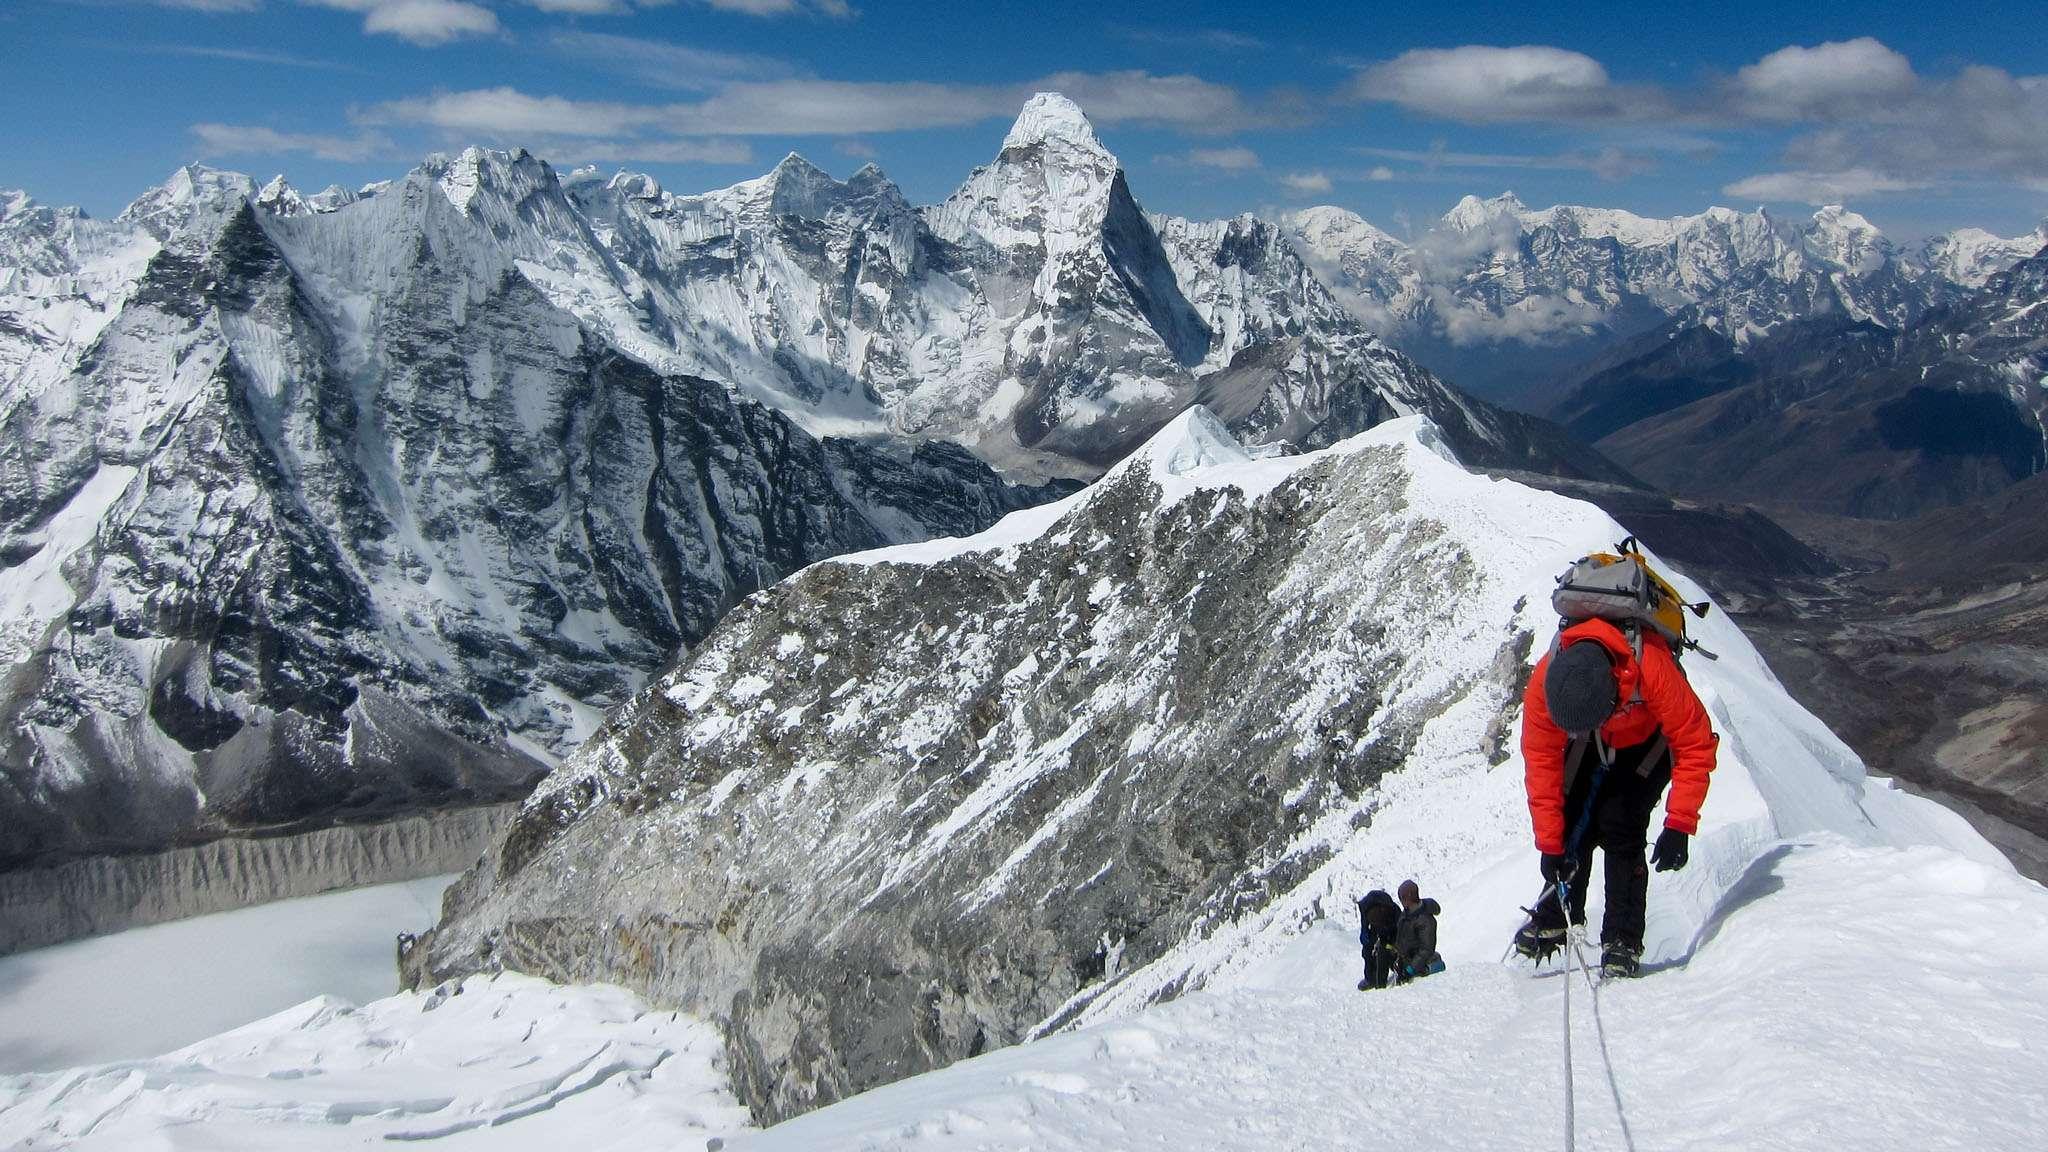 18-Day Island Peak Climb & Everest Base Camp - Nepal Itinerary